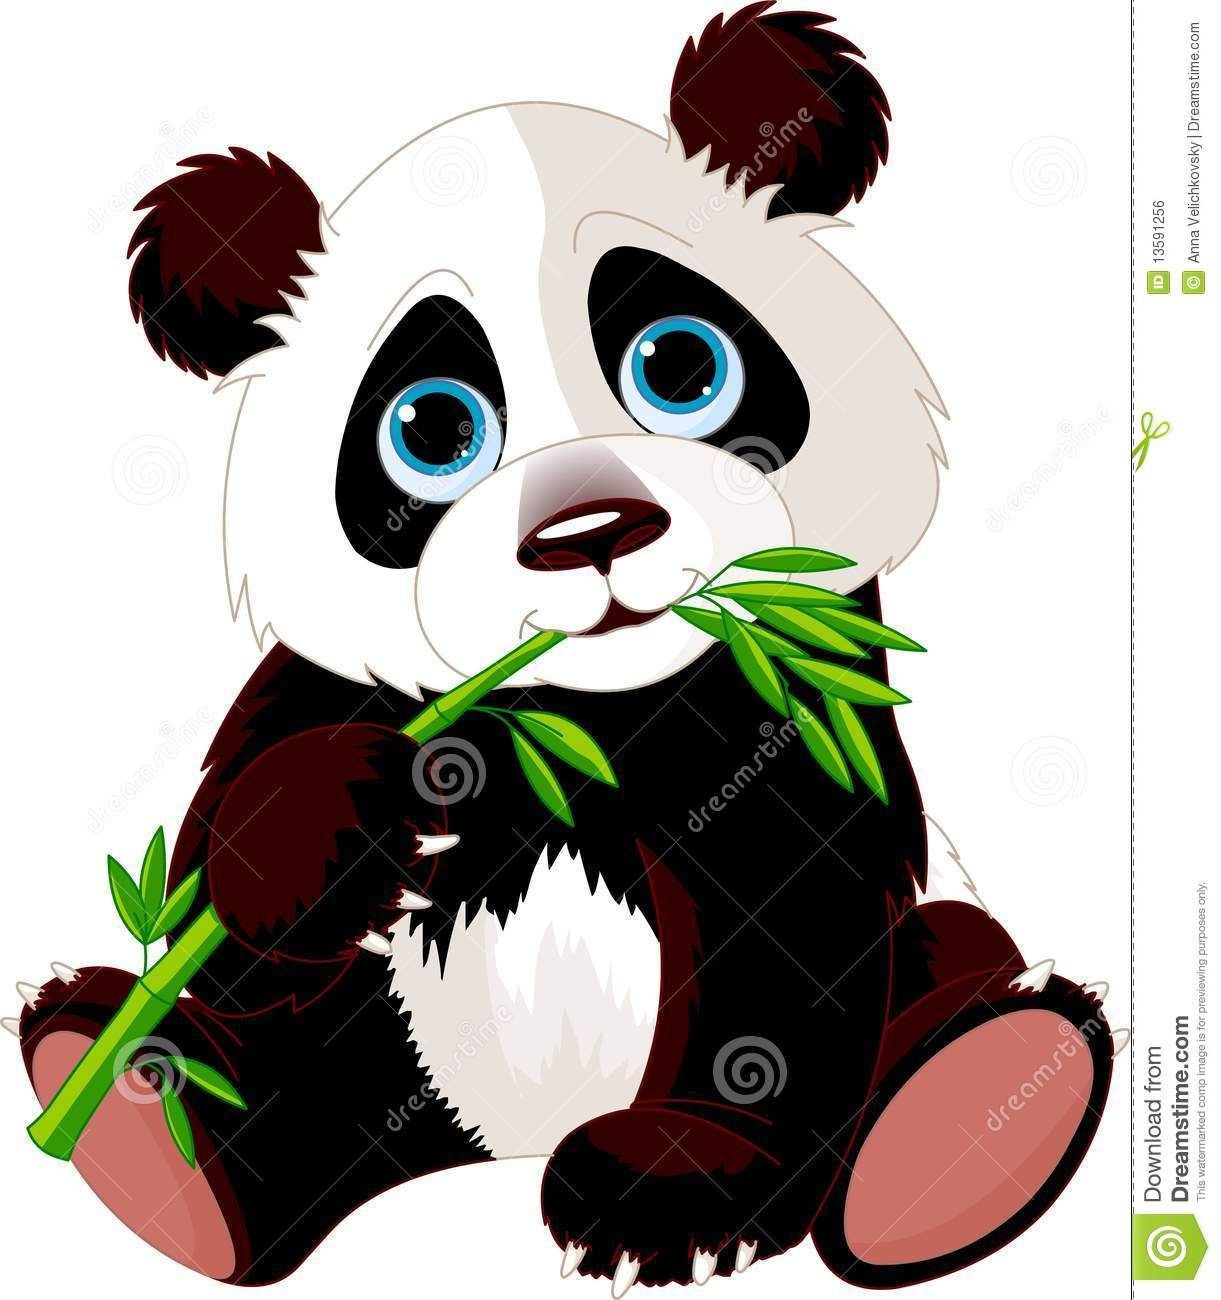 1221x1300 Panda Eating Bamboo Royalty Free Stock Image